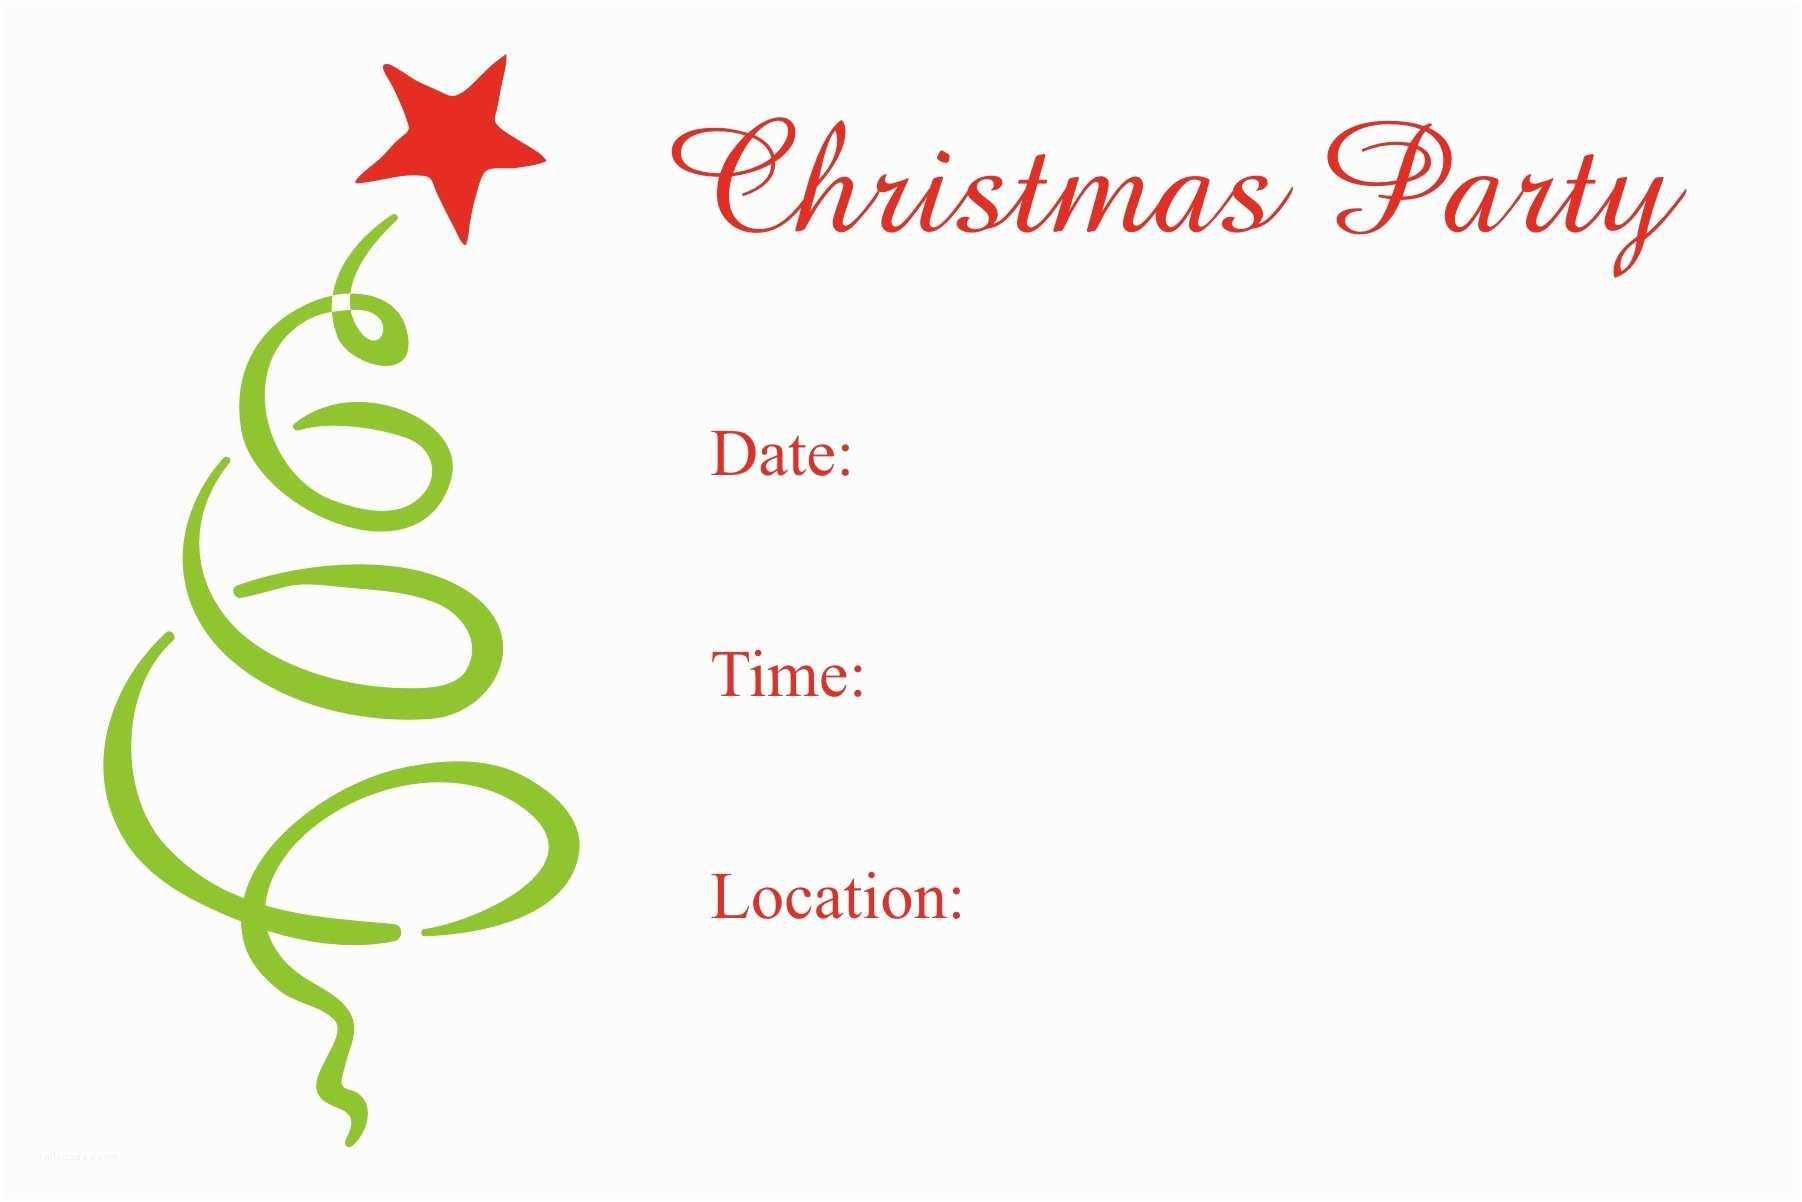 Free Christmas Party Invitation Templates Free Printable Christmas Party Invitations Templates